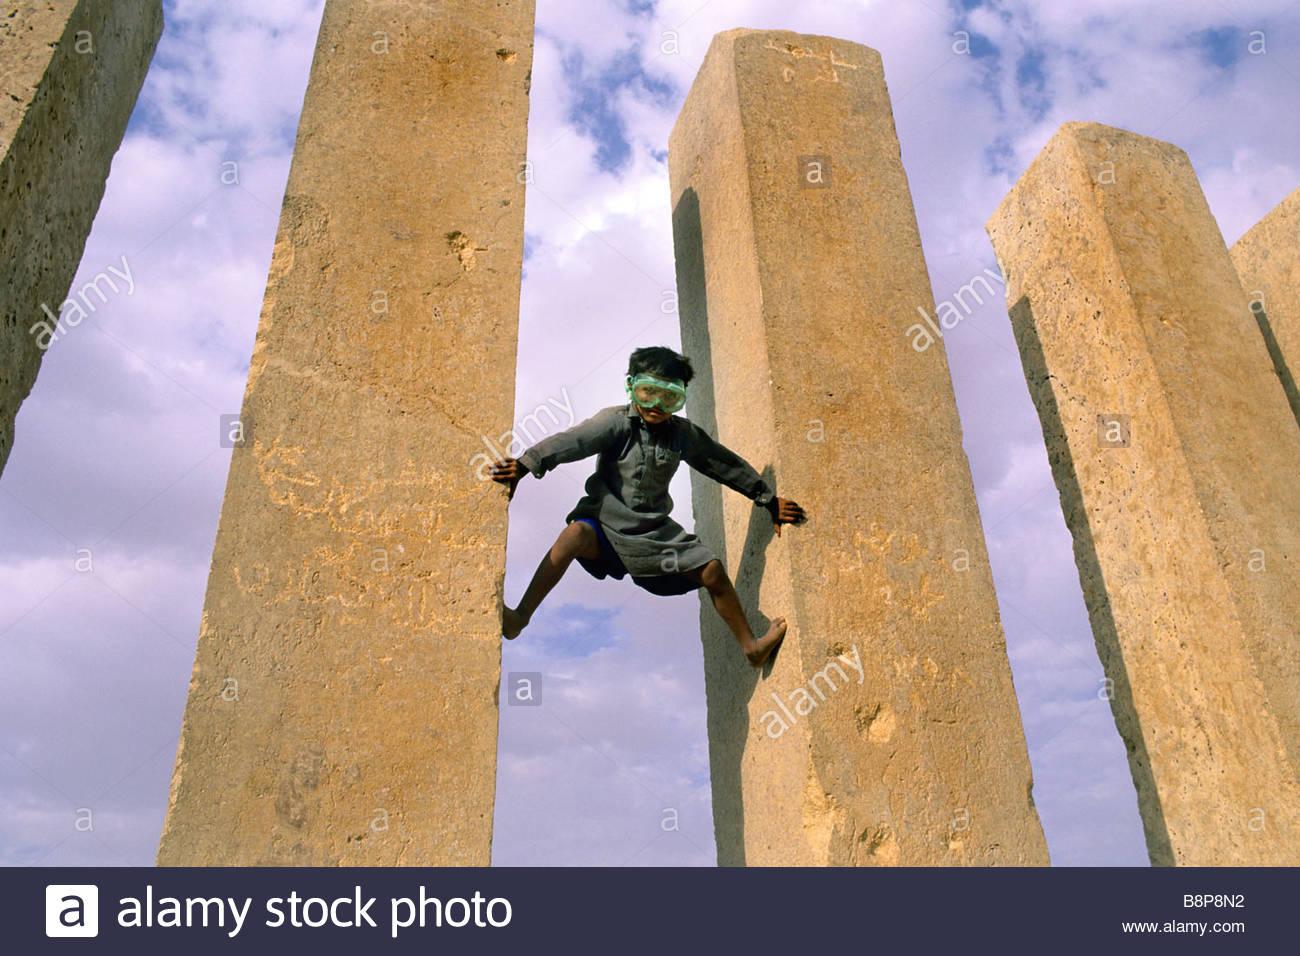 child with musk, sabean temple, marib, yemen, arabian peninsula - Stock Image